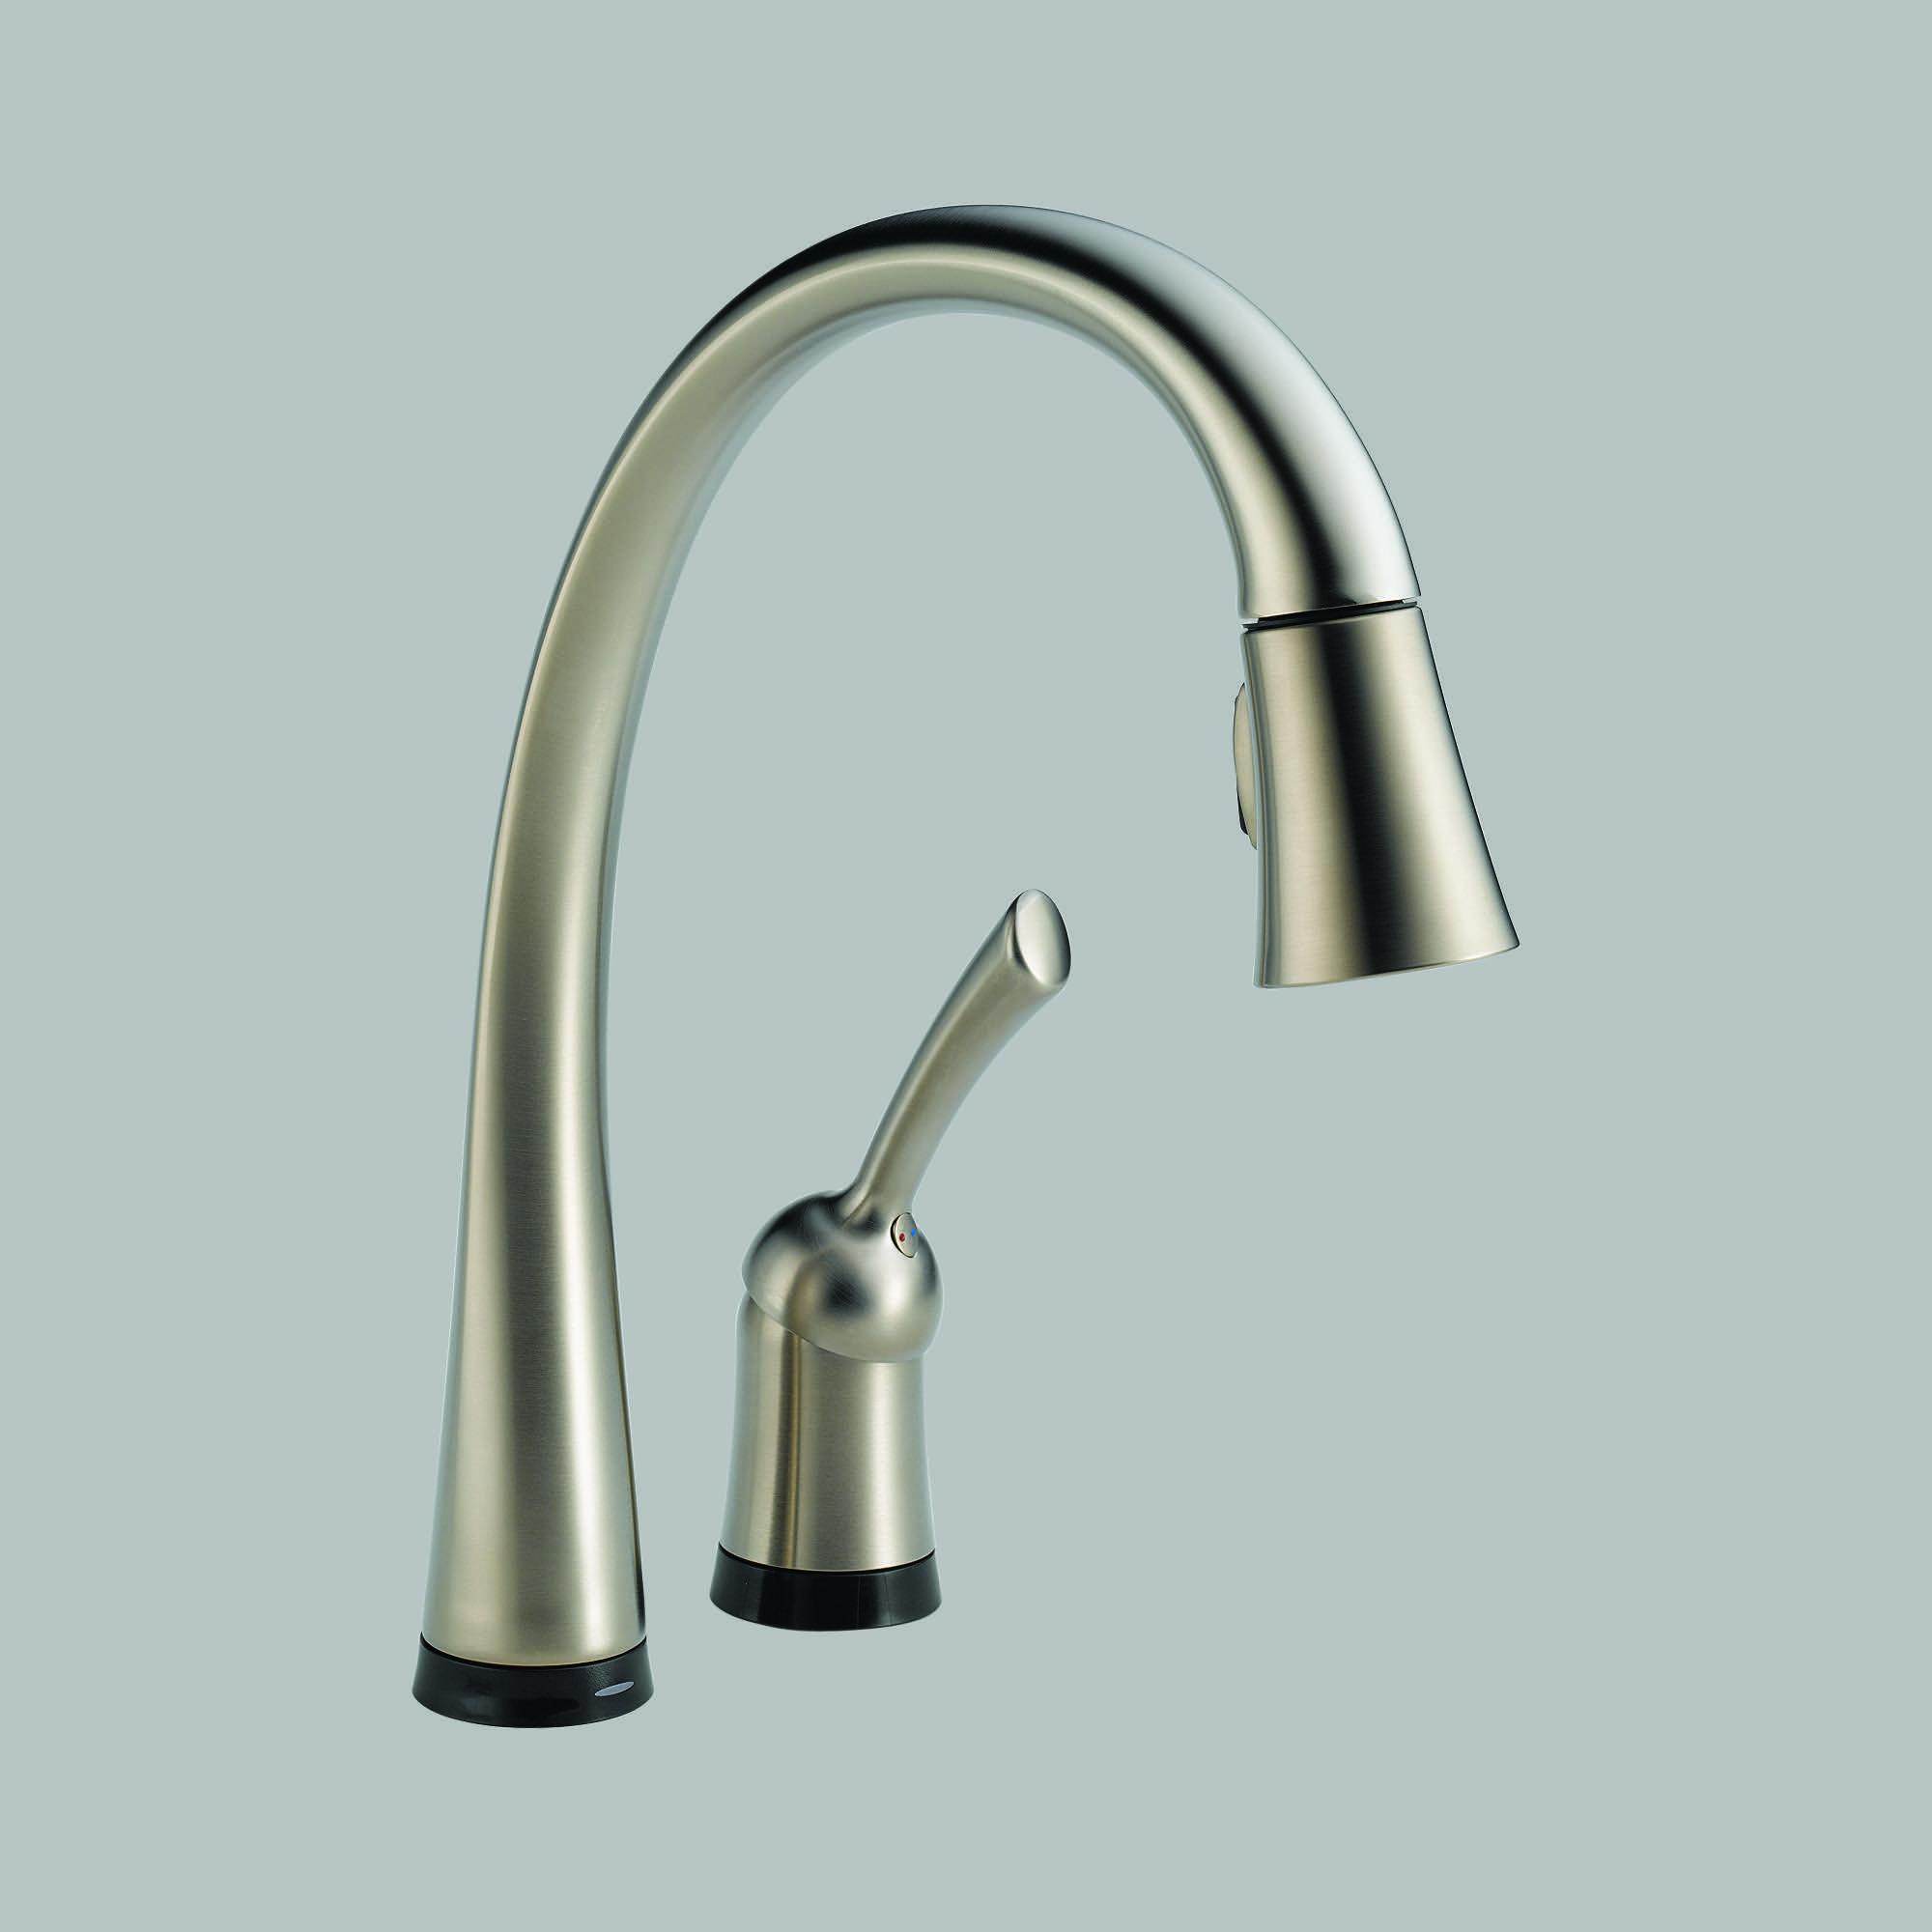 delta touch kitchen faucet cork flooring 980t ar dst soci